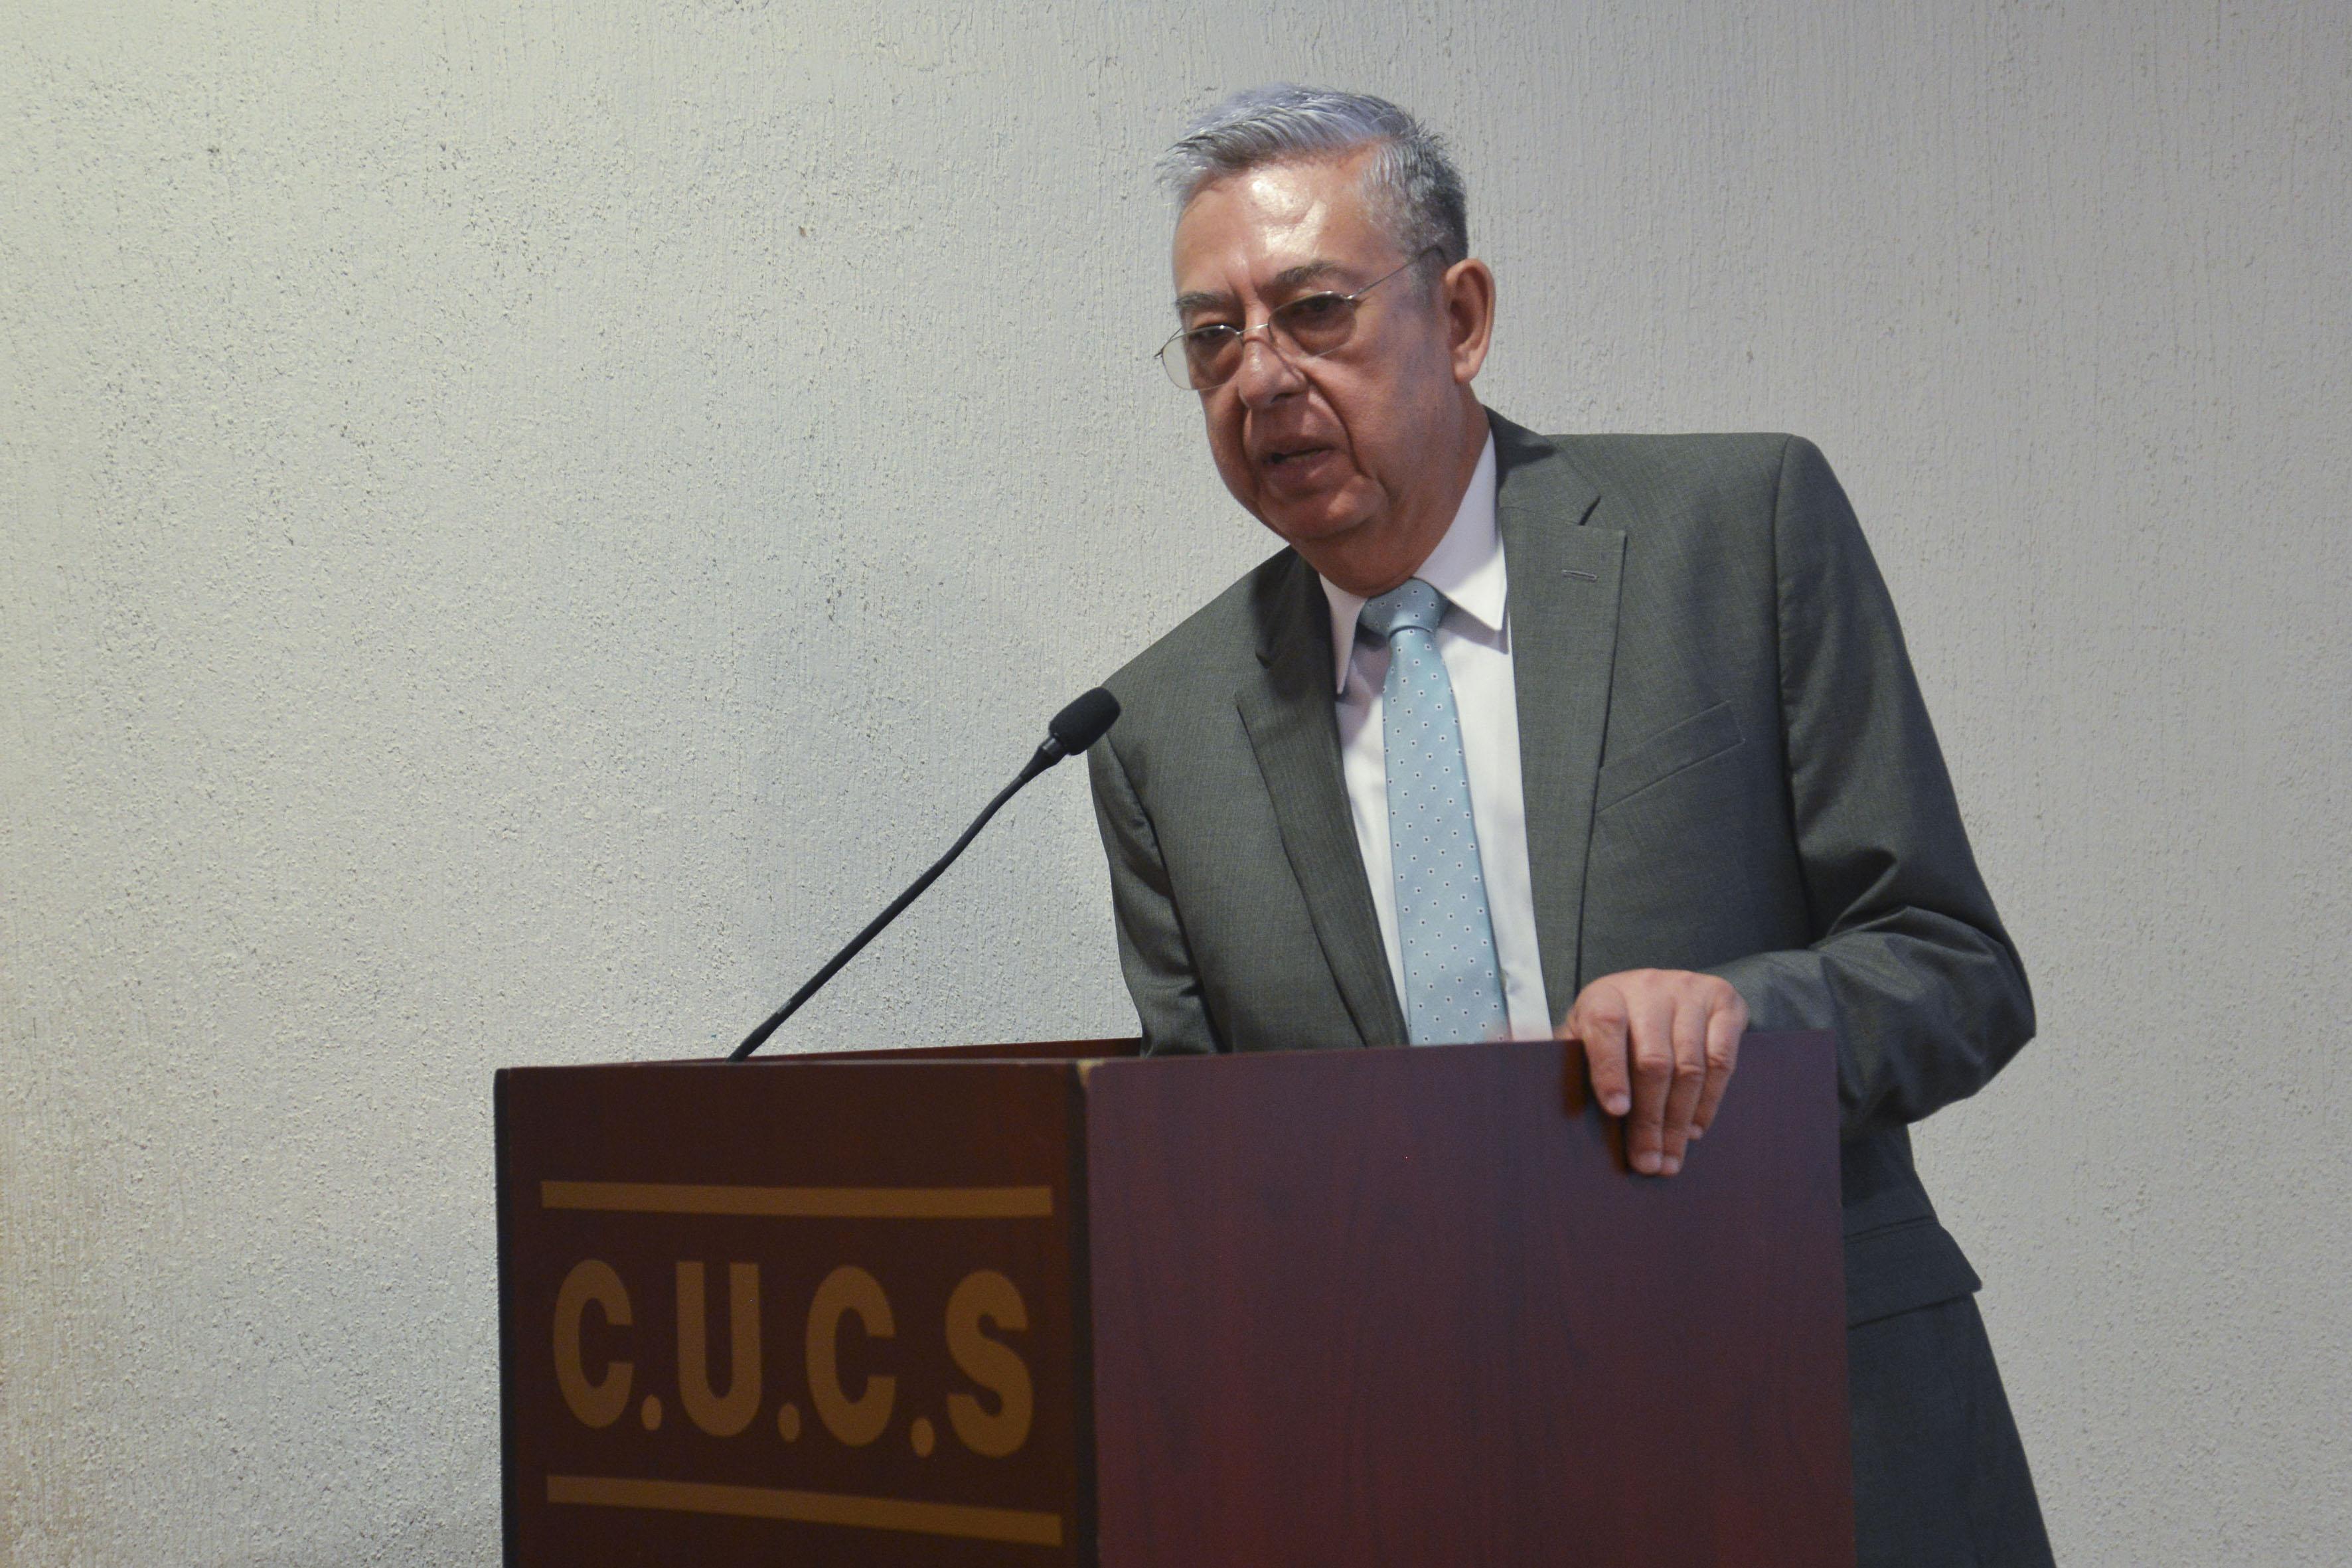 Dr. Zambrano Guzmán inaugurando el evento